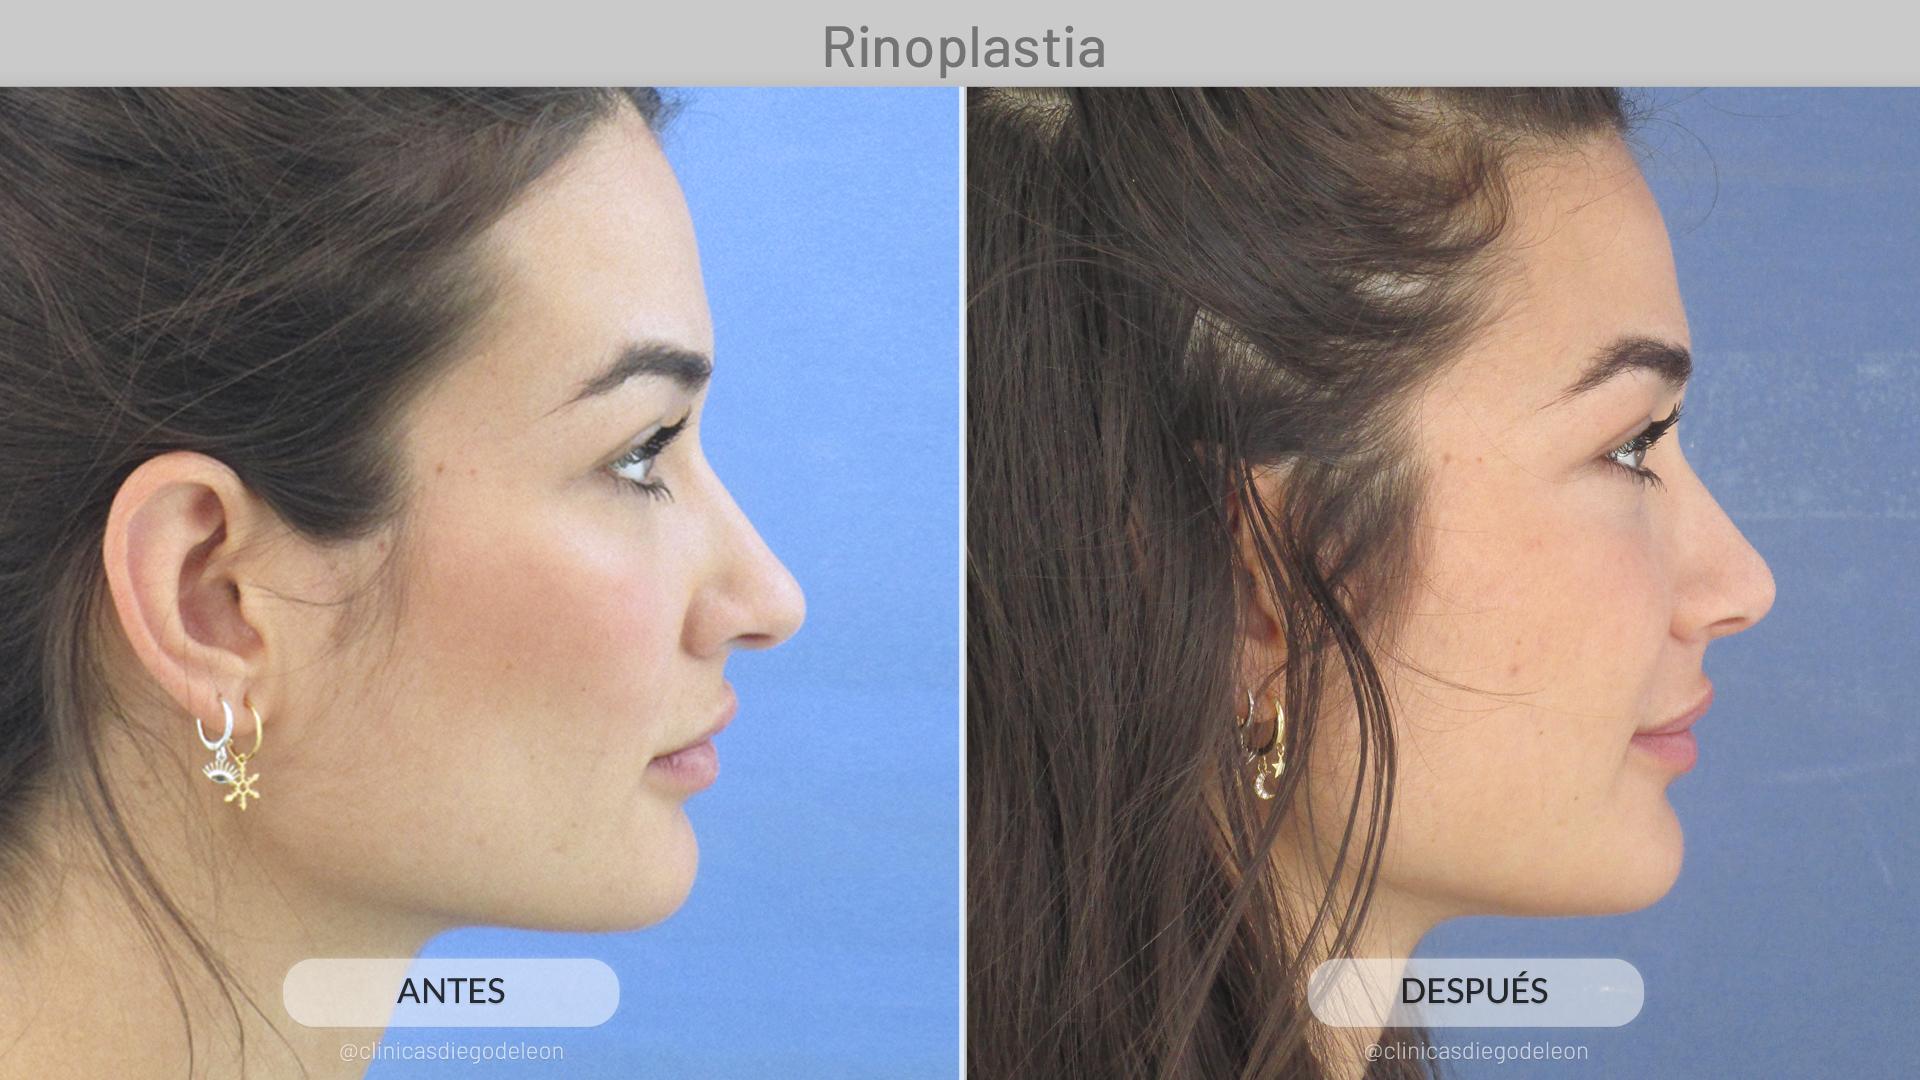 rinoplastia-antesydespues-estelagrande